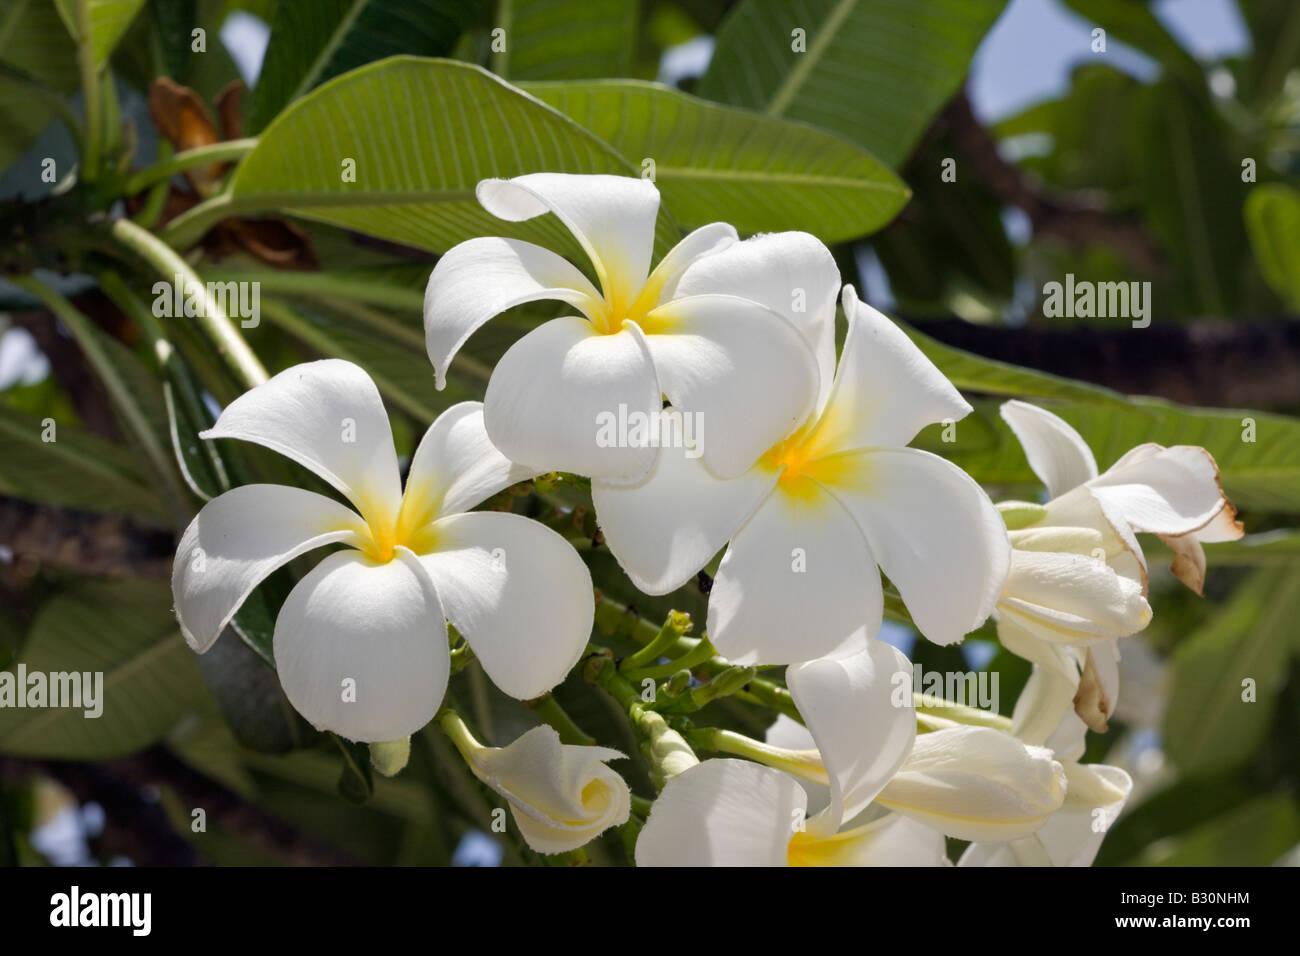 Plumeria Flowers Plumeria alba Marshall Islands Bikini Atoll Micronesia Pacific Ocean - Stock Image